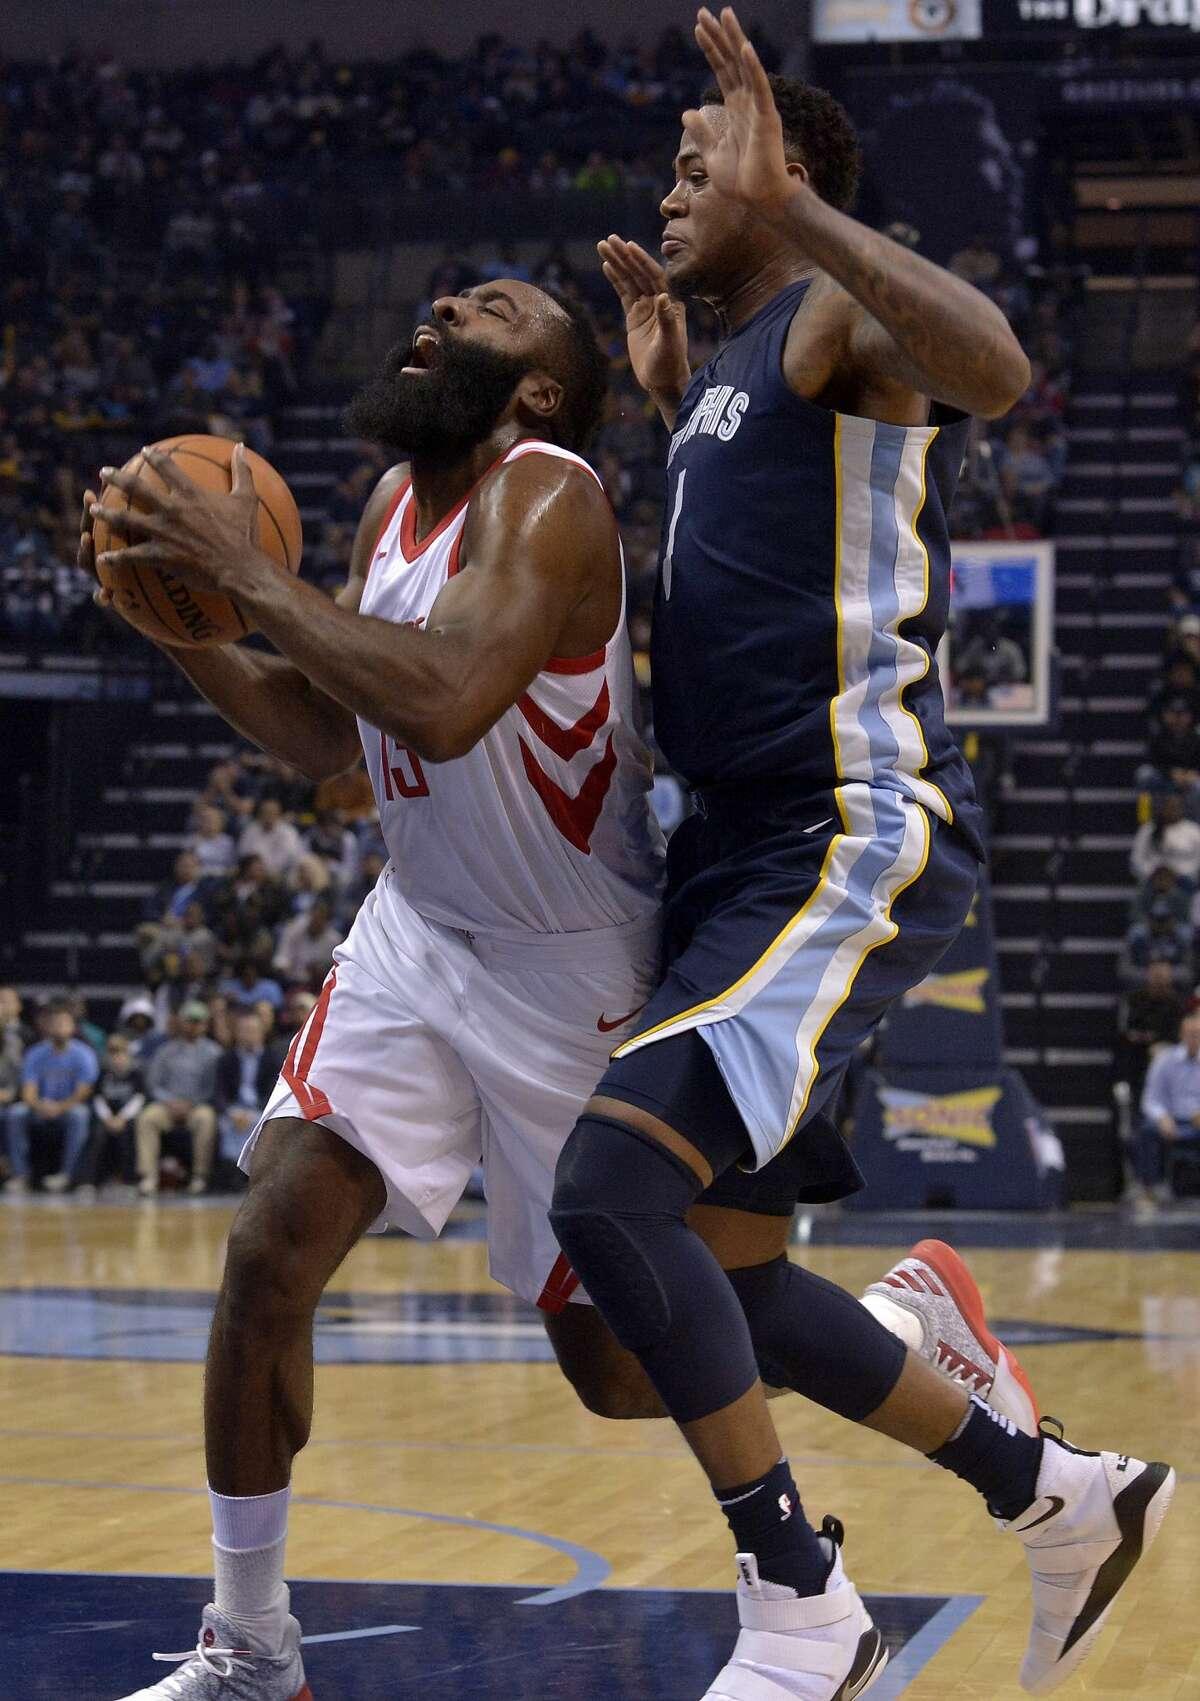 Houston Rockets guard James Harden, left, drives against Memphis Grizzlies forward Jarell Martin (1) in the first half of an NBA basketball game Saturday, Oct. 28, 2017, in Memphis, Tenn. (AP Photo/Brandon Dill)